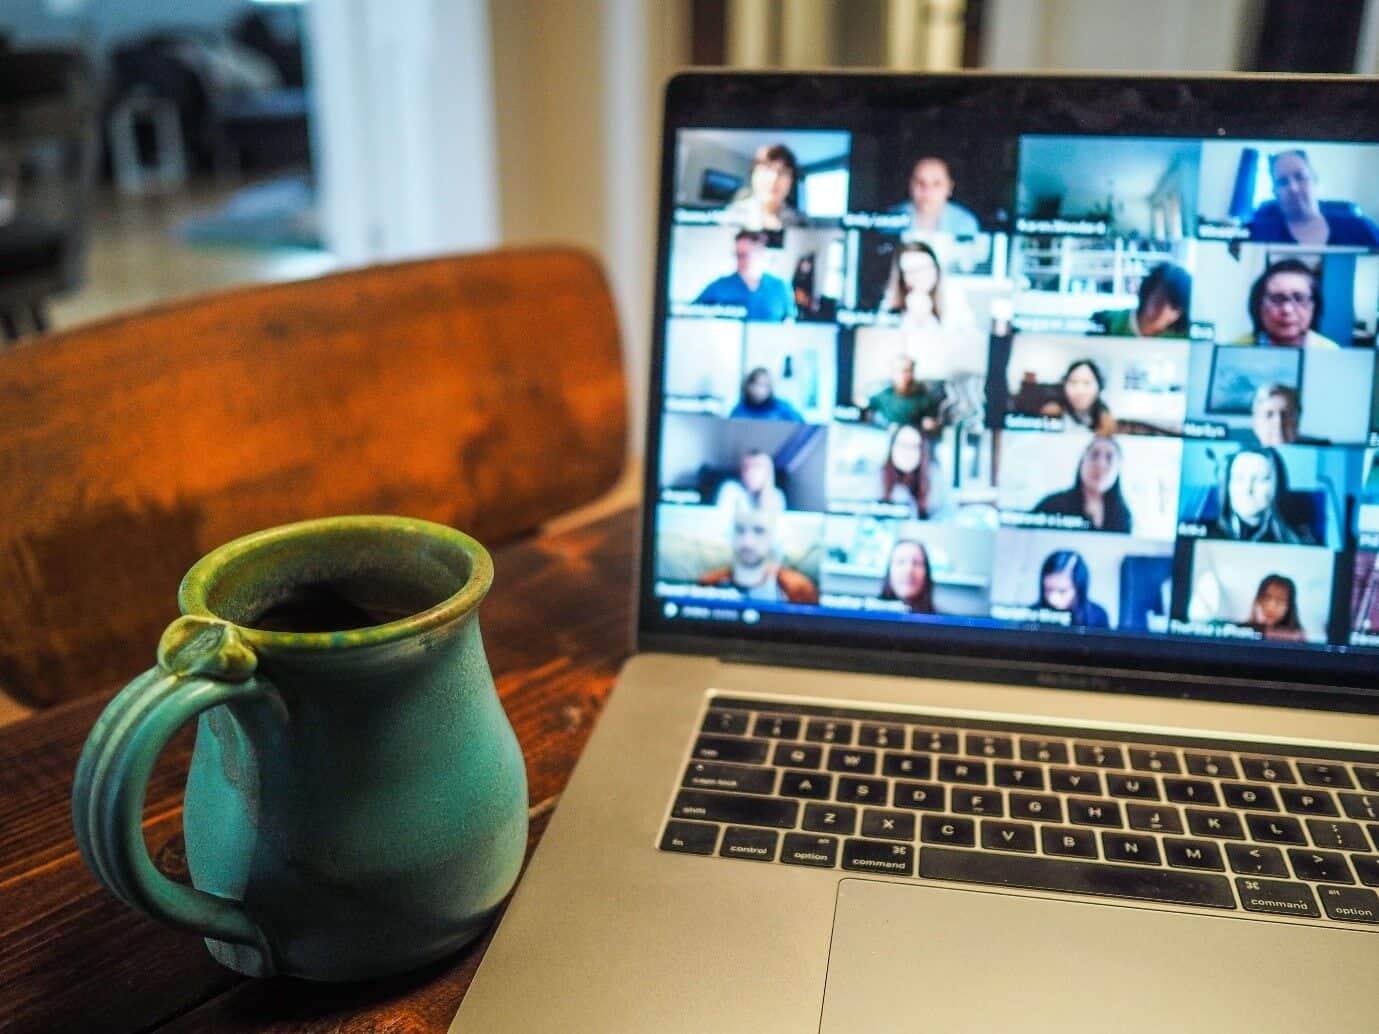 content/es-es/images/repository/isc/2020/videoconferencing1.jpg